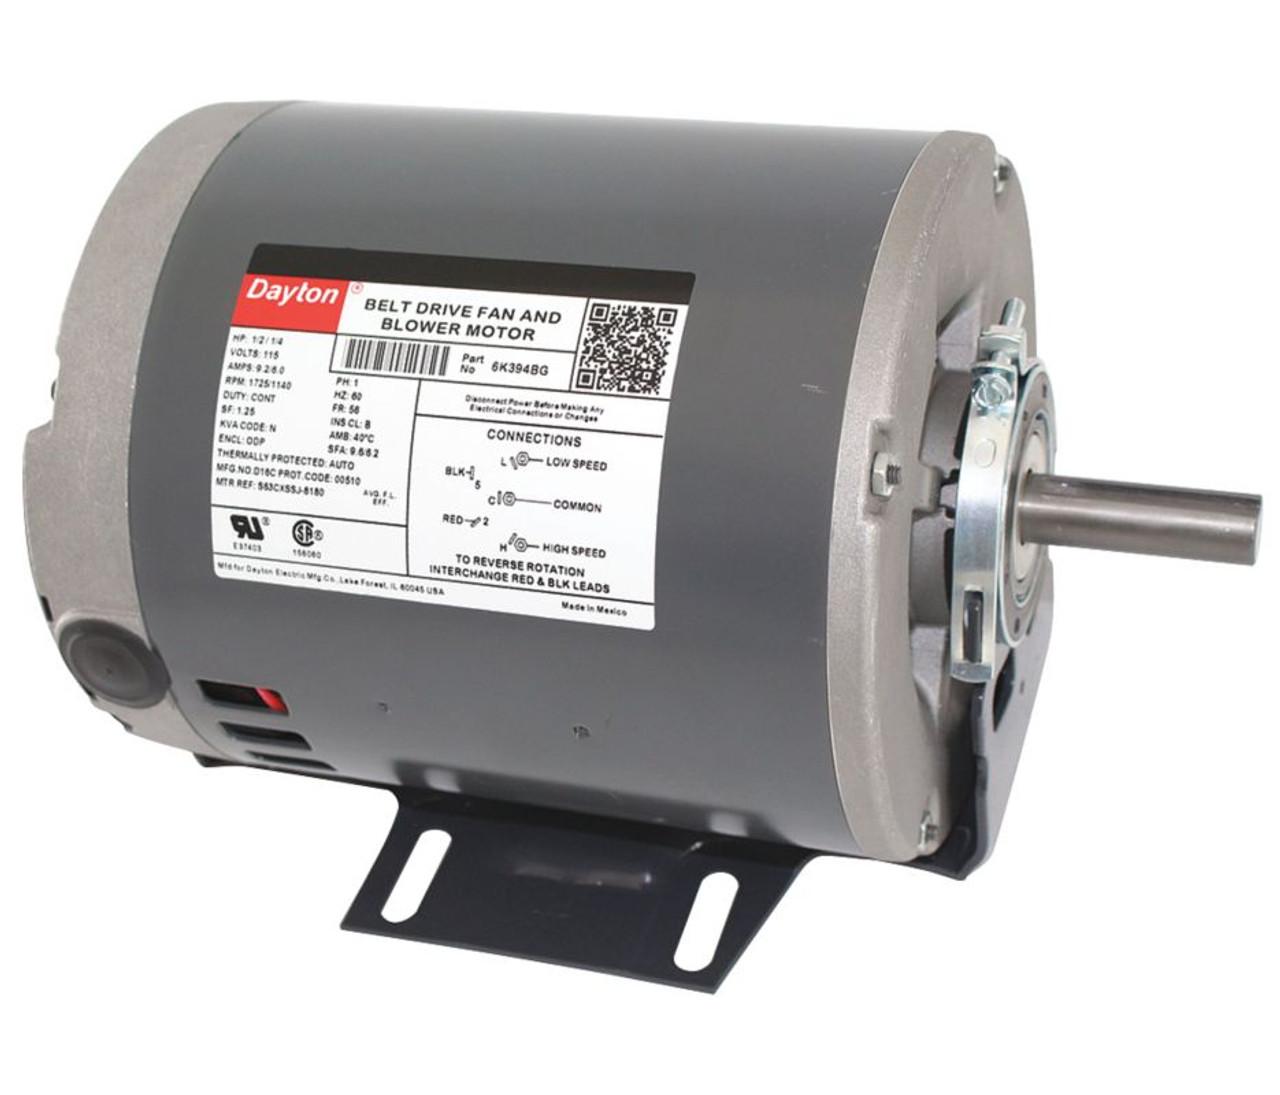 Dayton Dc Motor Wiring Schematic - Schematic And Wiring Diagrams on